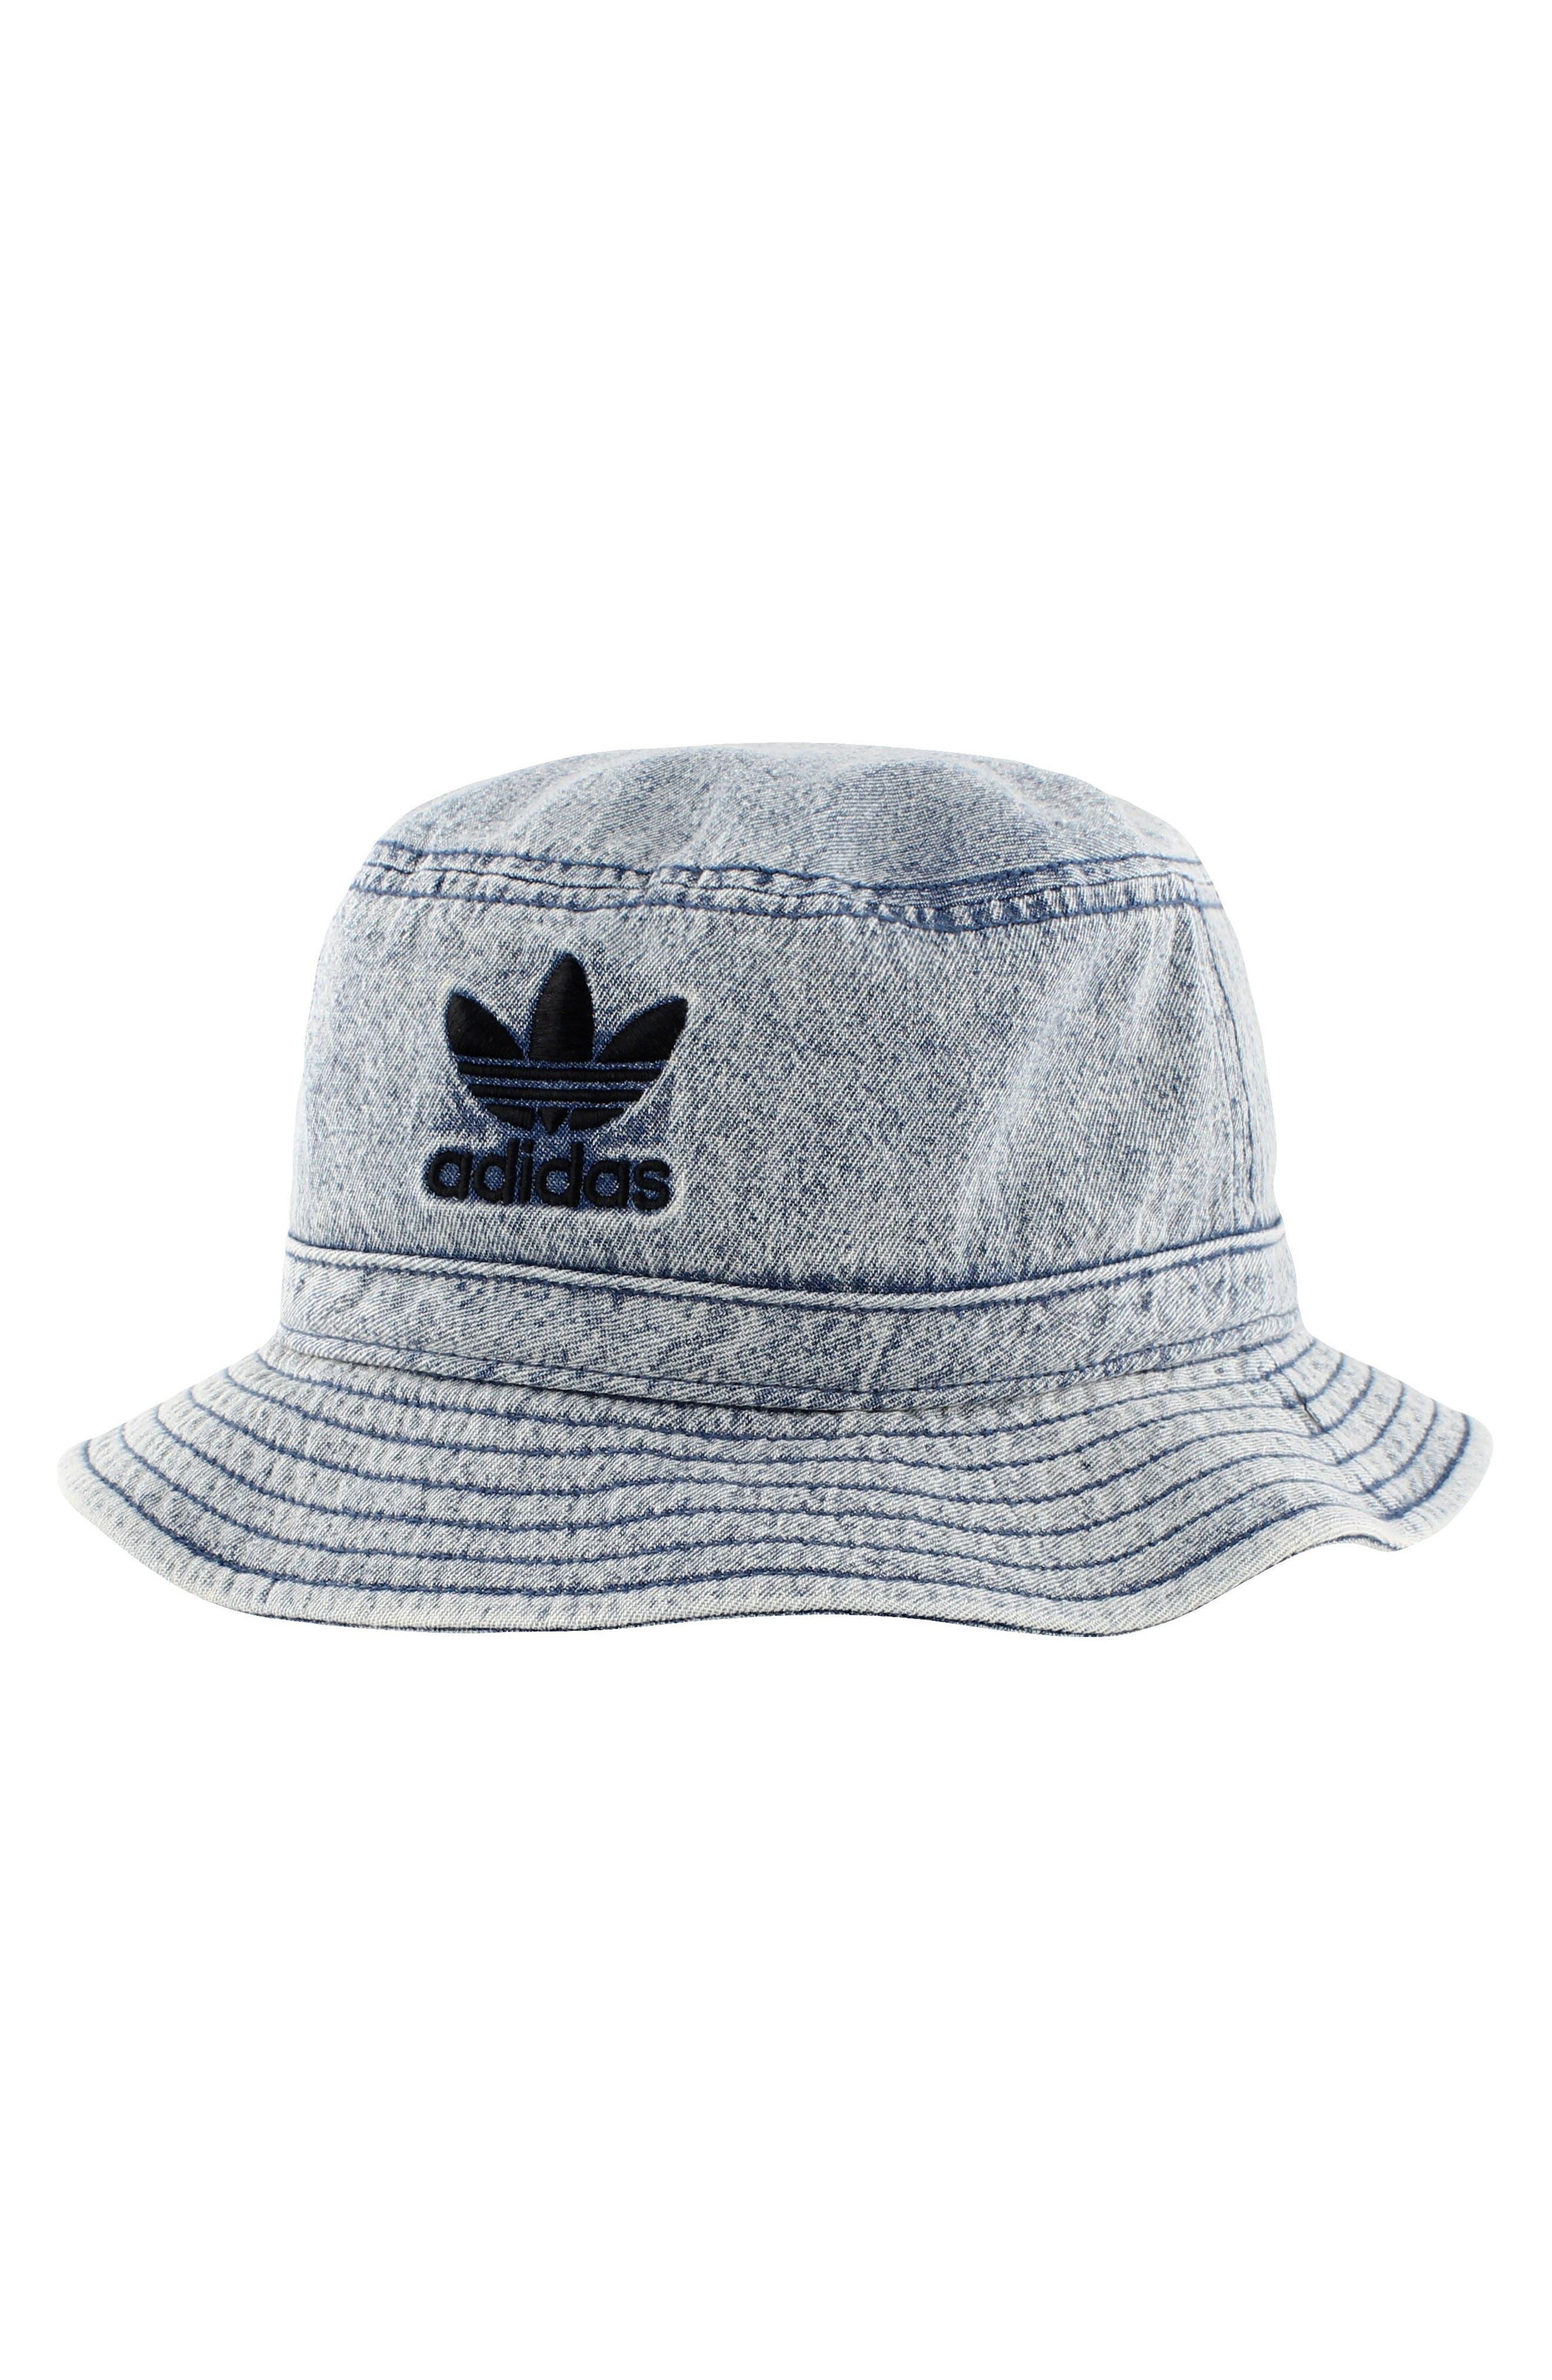 Denim Bucket Hat,                             Main thumbnail 1, color,                             Navy/ Black